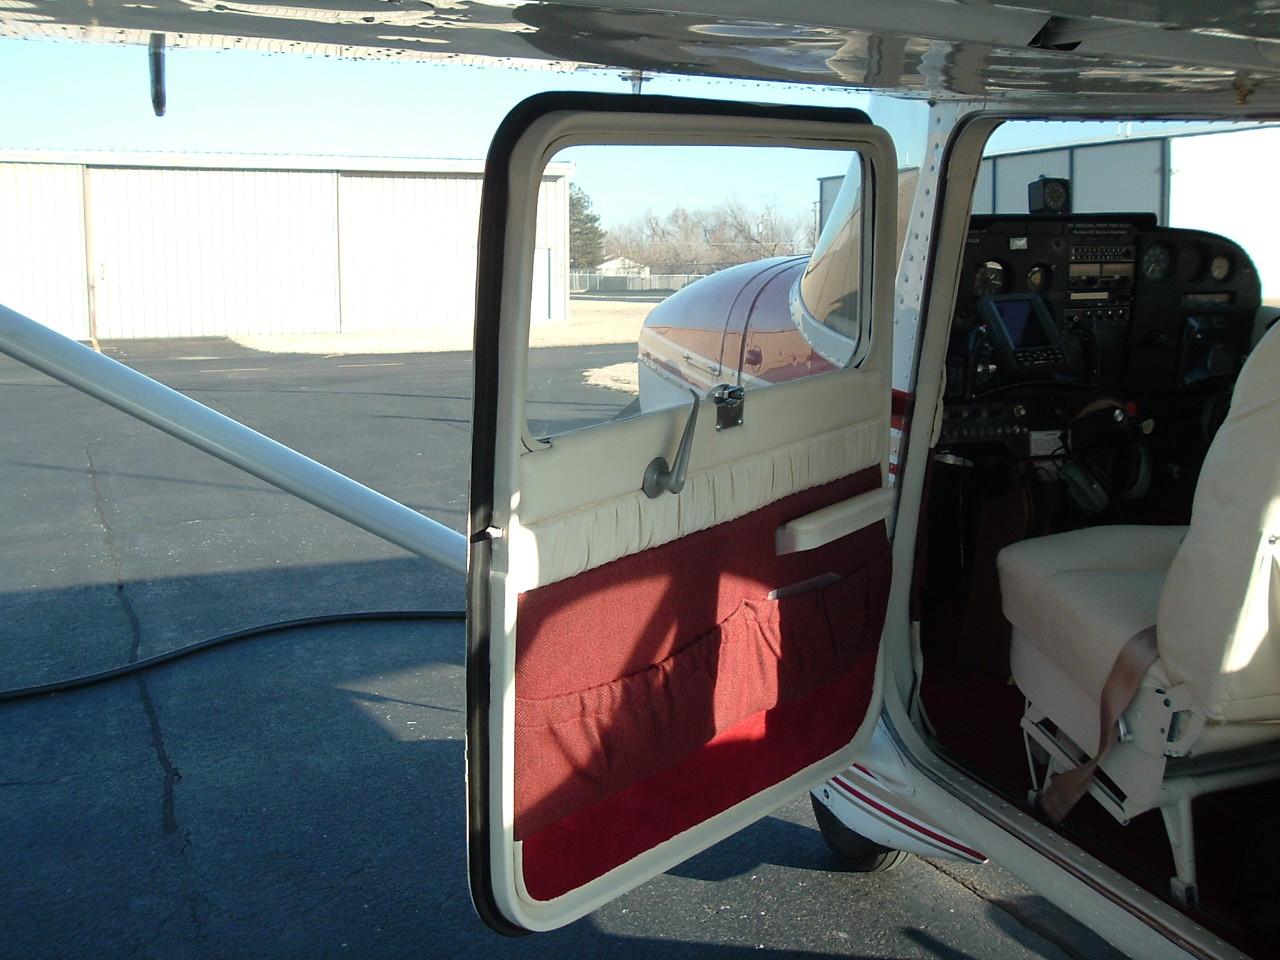 Door Seal, Front Entry, Cessna 150, 152, 170, 172, 175, 180, 182, 185, 205,  206, 207, 210, 336, 337, ADS-C1401